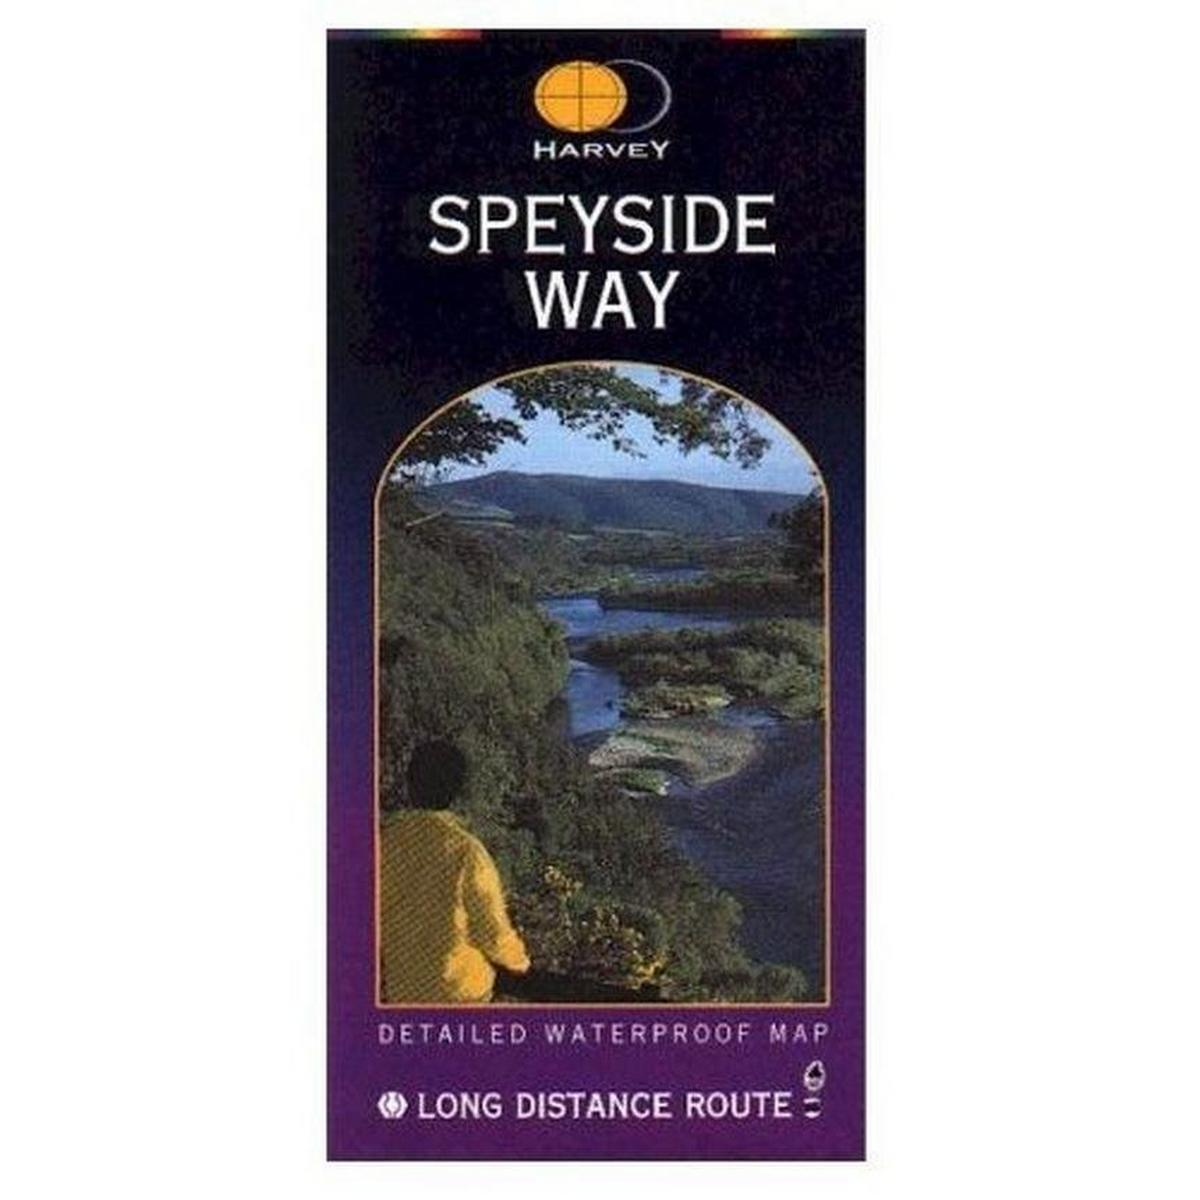 Harveys Harvey Map: Speyside Way